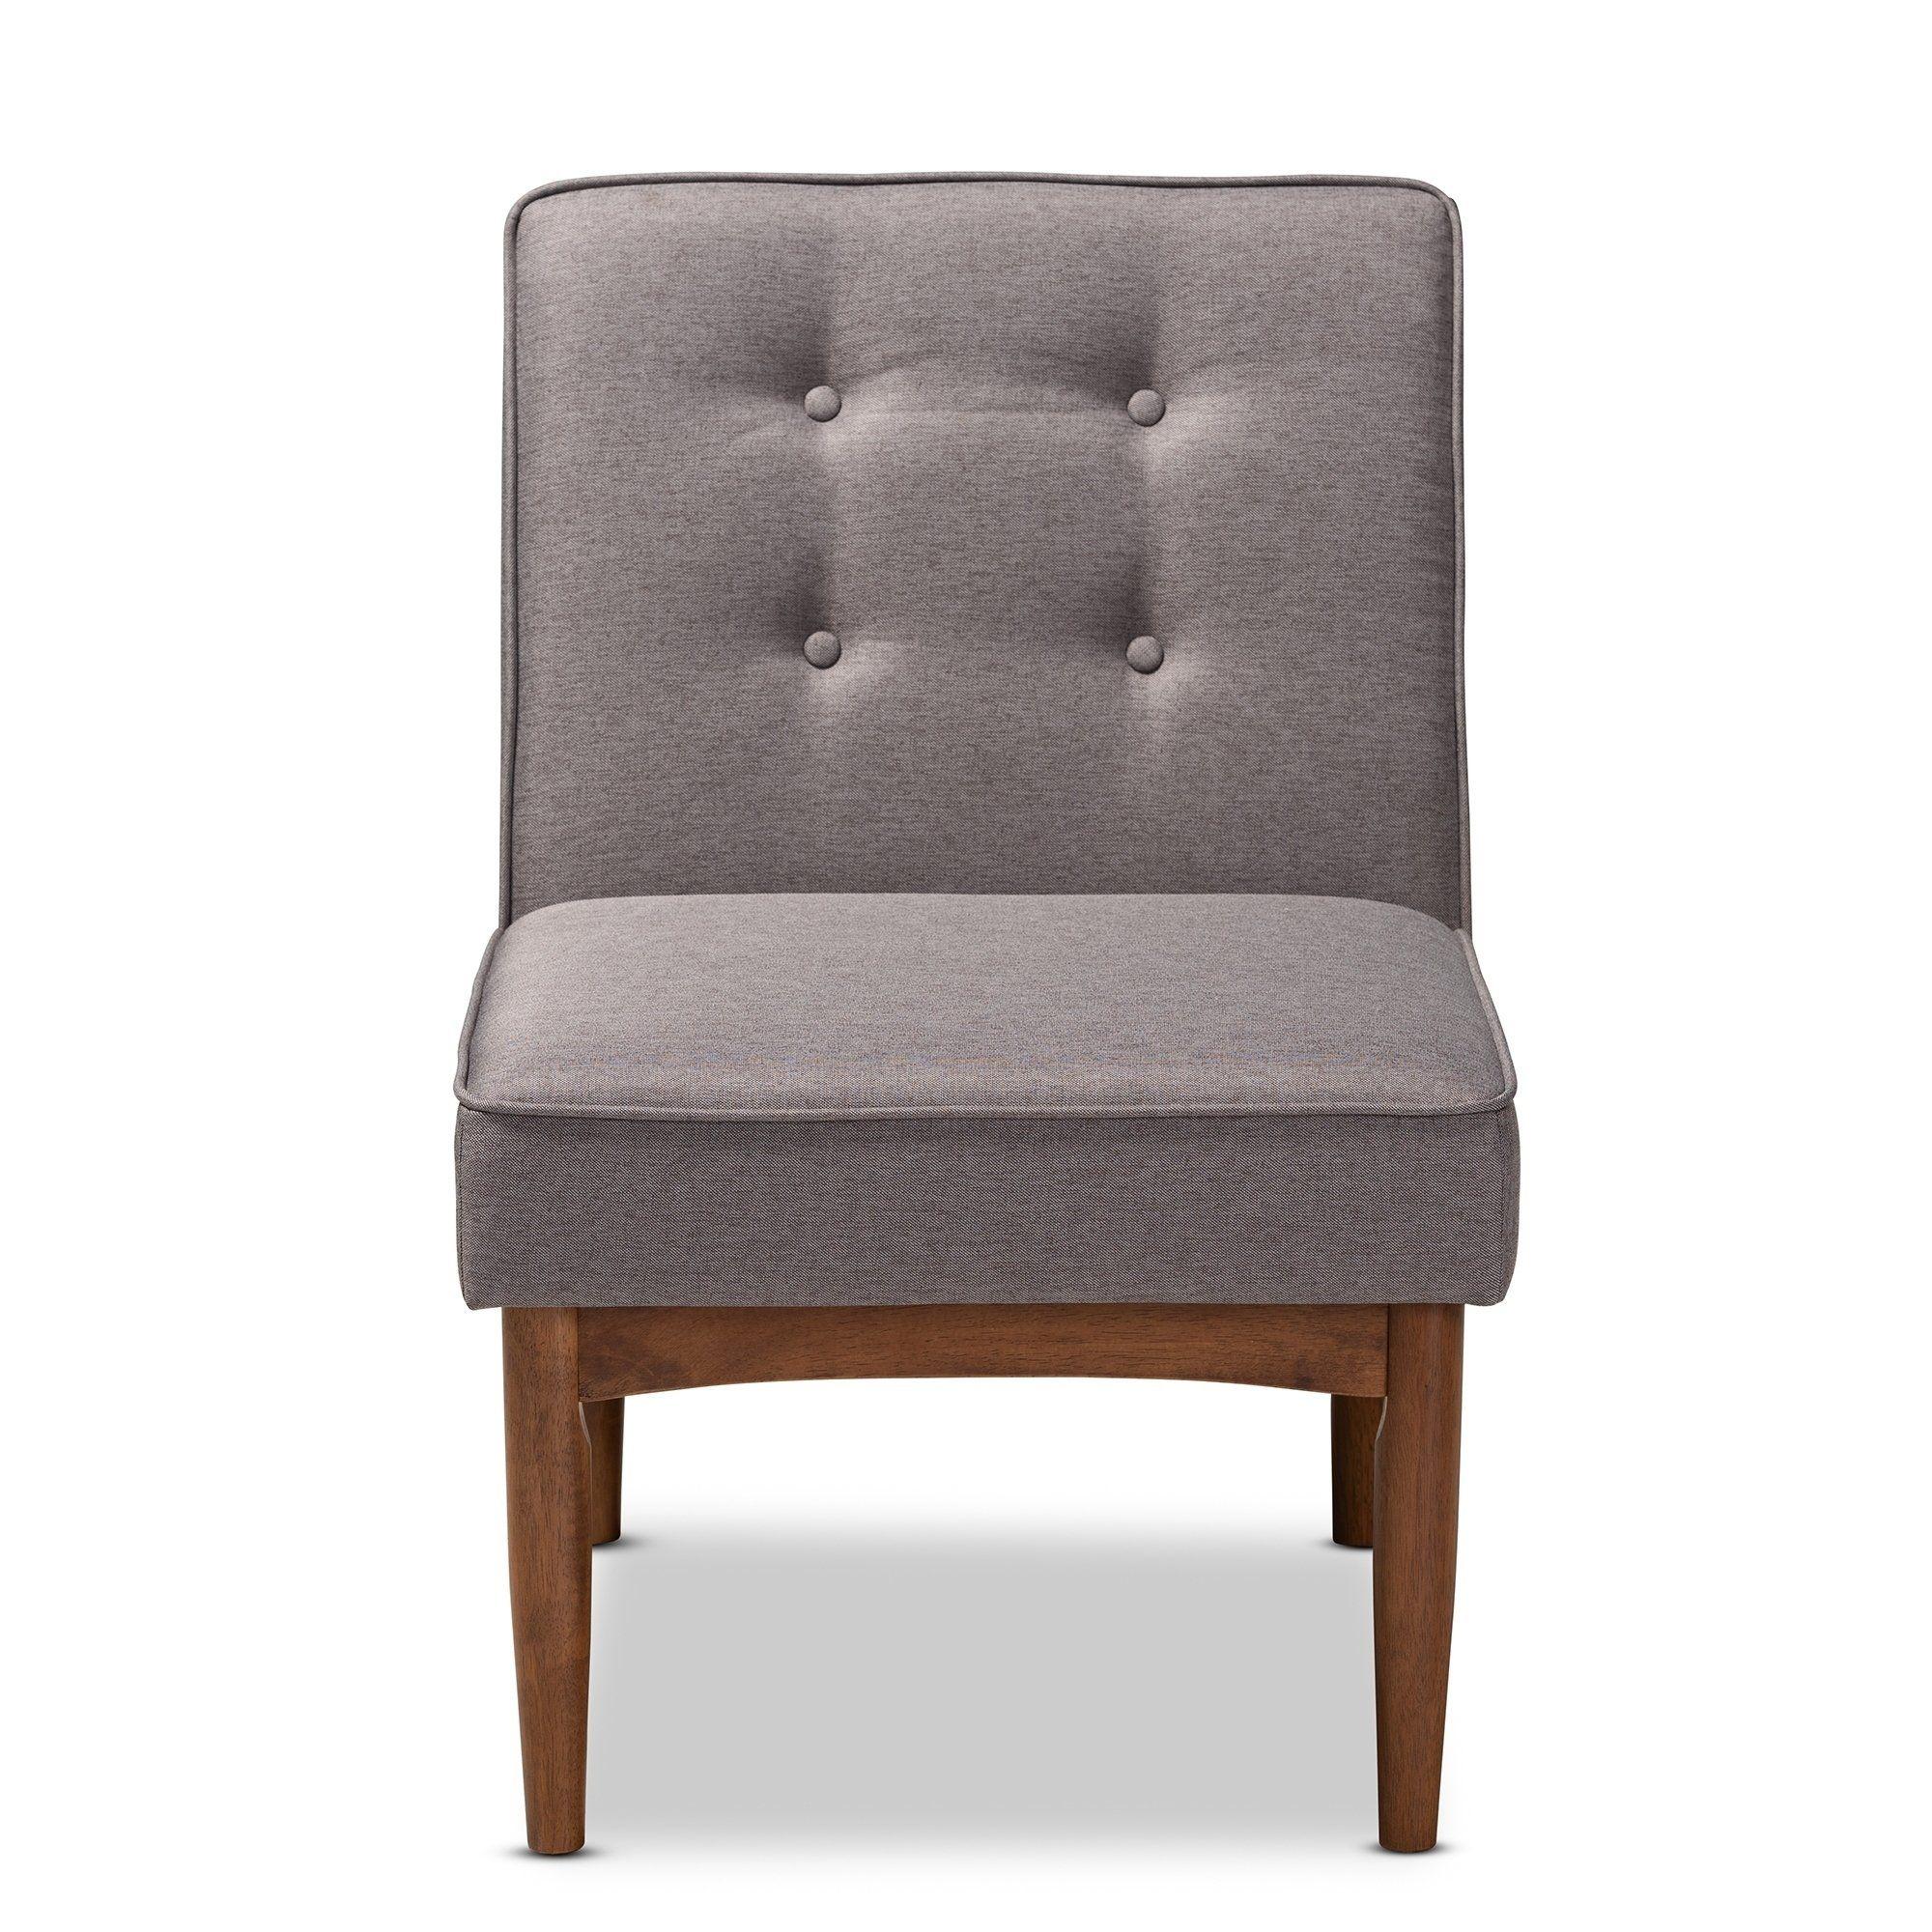 Our Best Dining Room Bar Furniture Deals Fabric Dining Chairs Woven Dining Chairs Dining Chairs